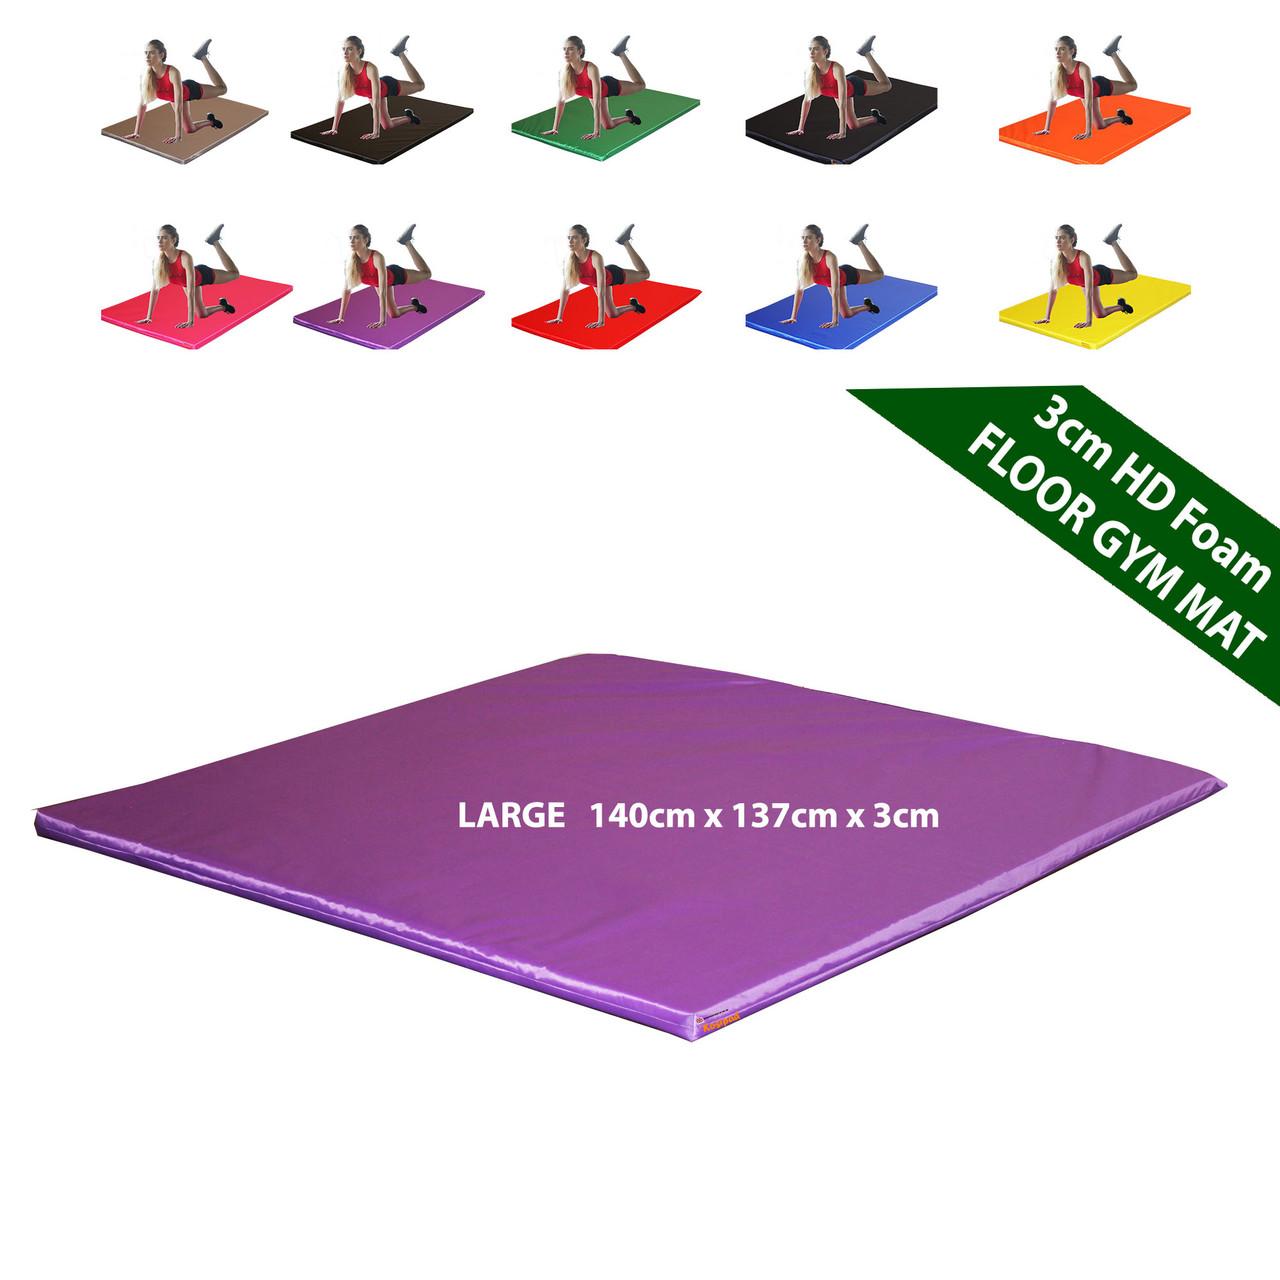 Kosipad 3cm Thick foam floor gym crash mats Purple Large